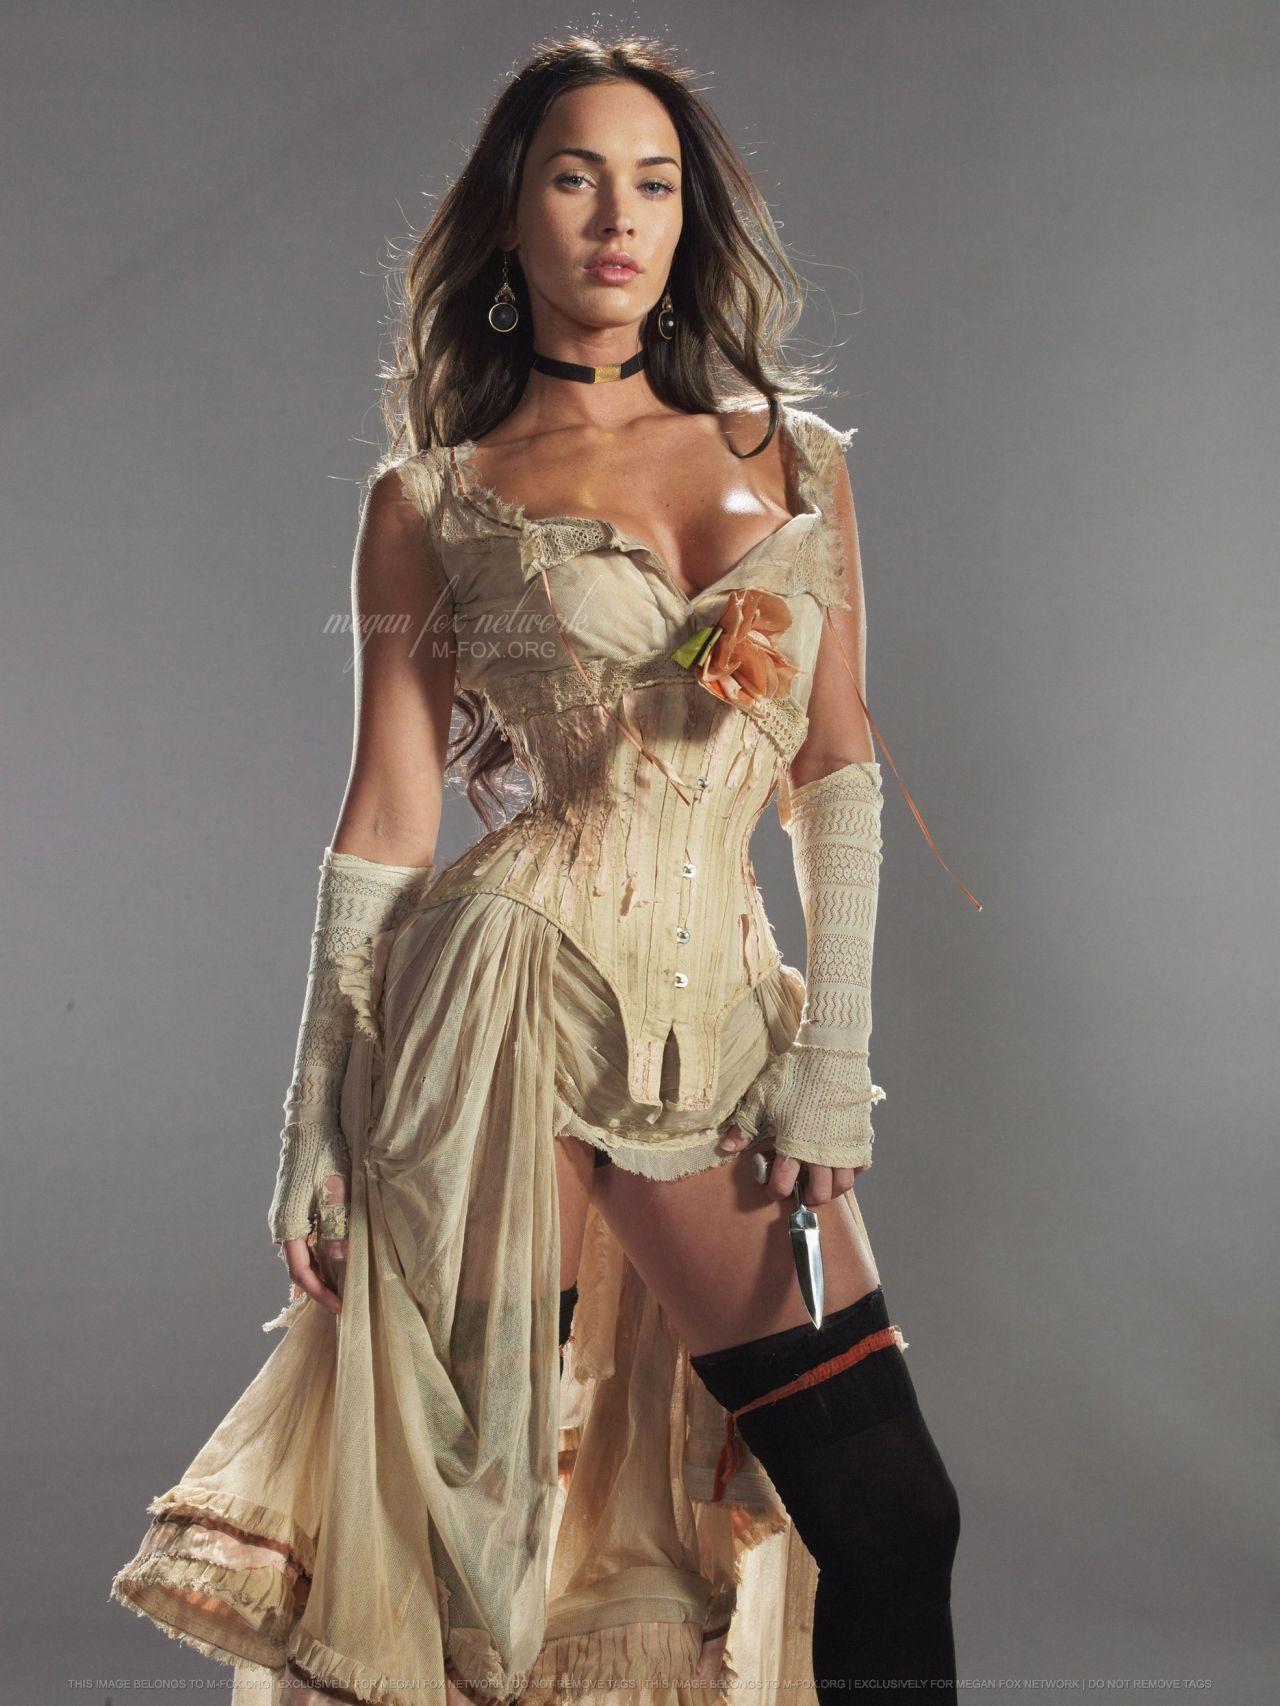 Megan Fox Jonah Hex